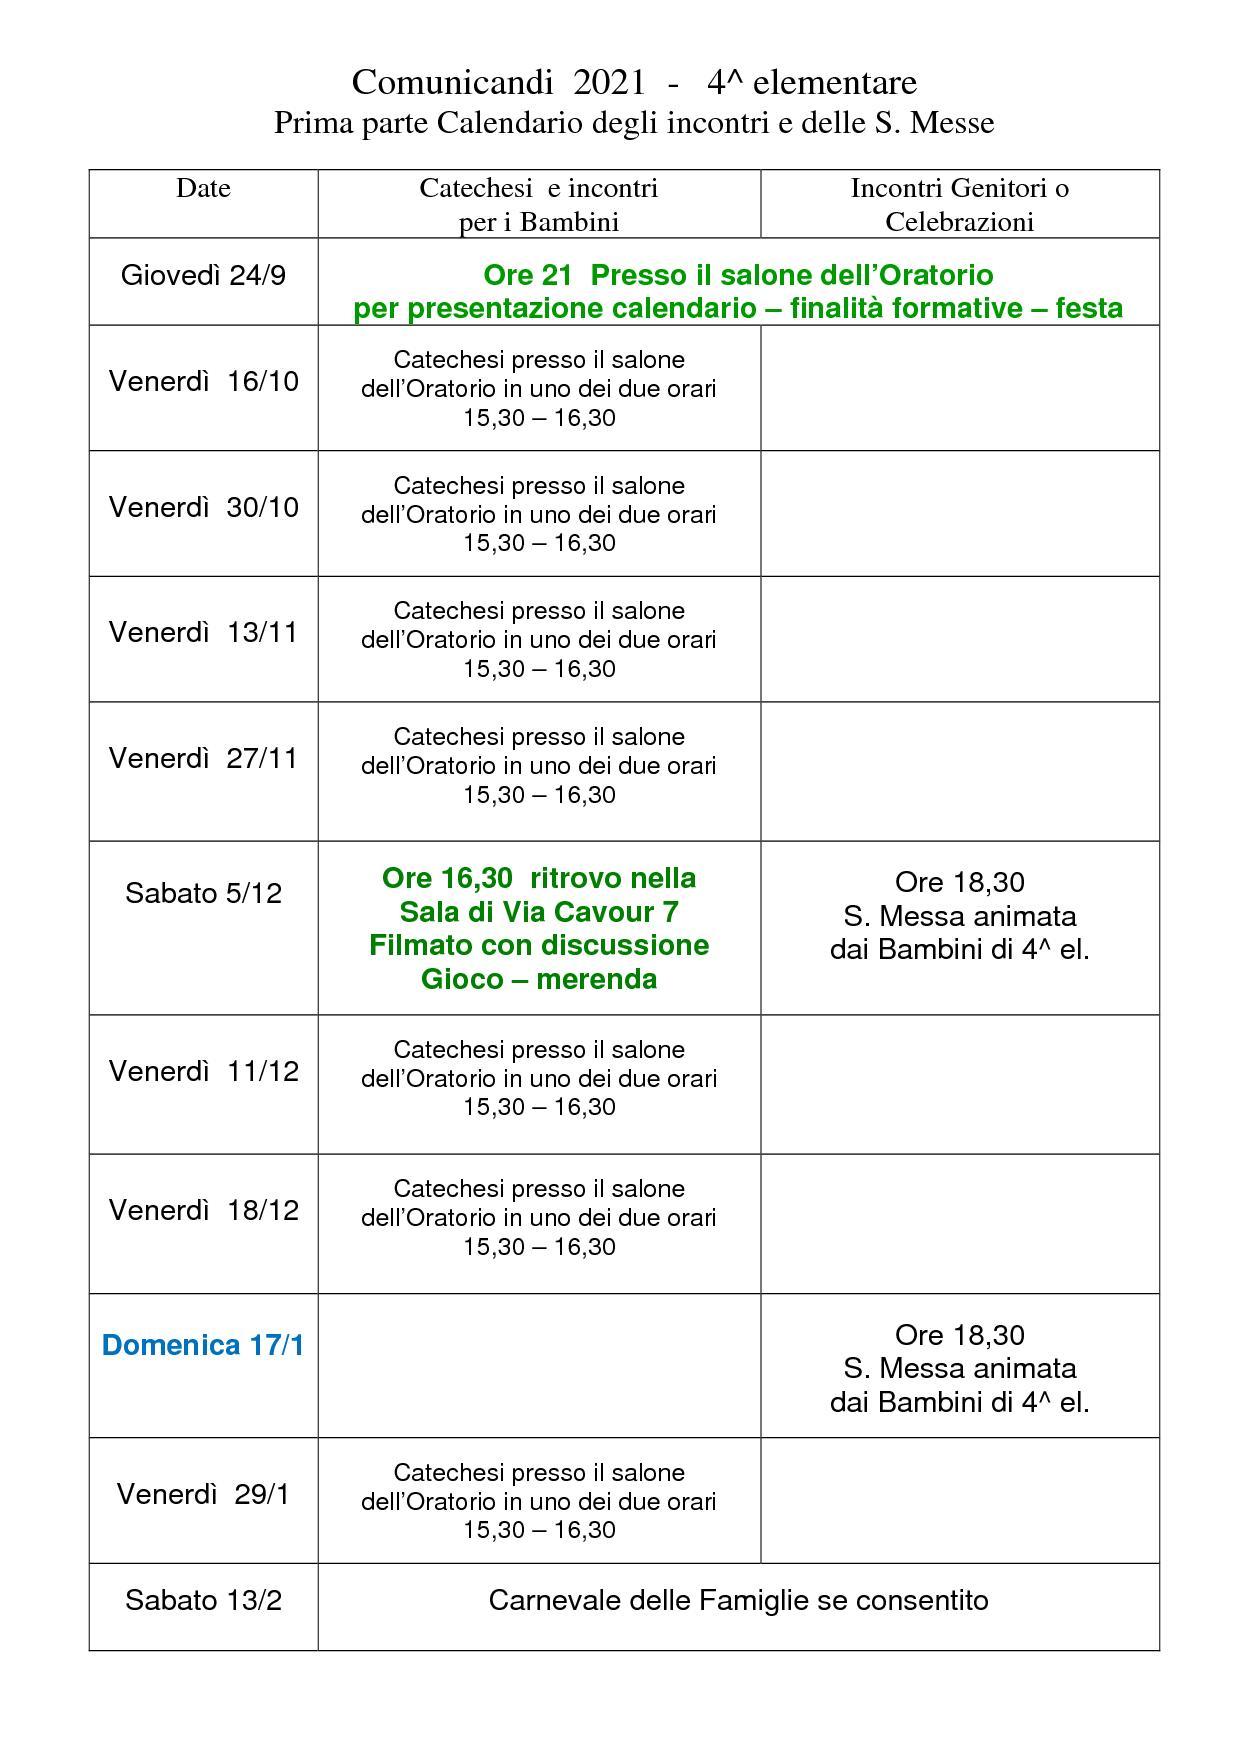 Oratorio - Catechismo Ott 20 (04)